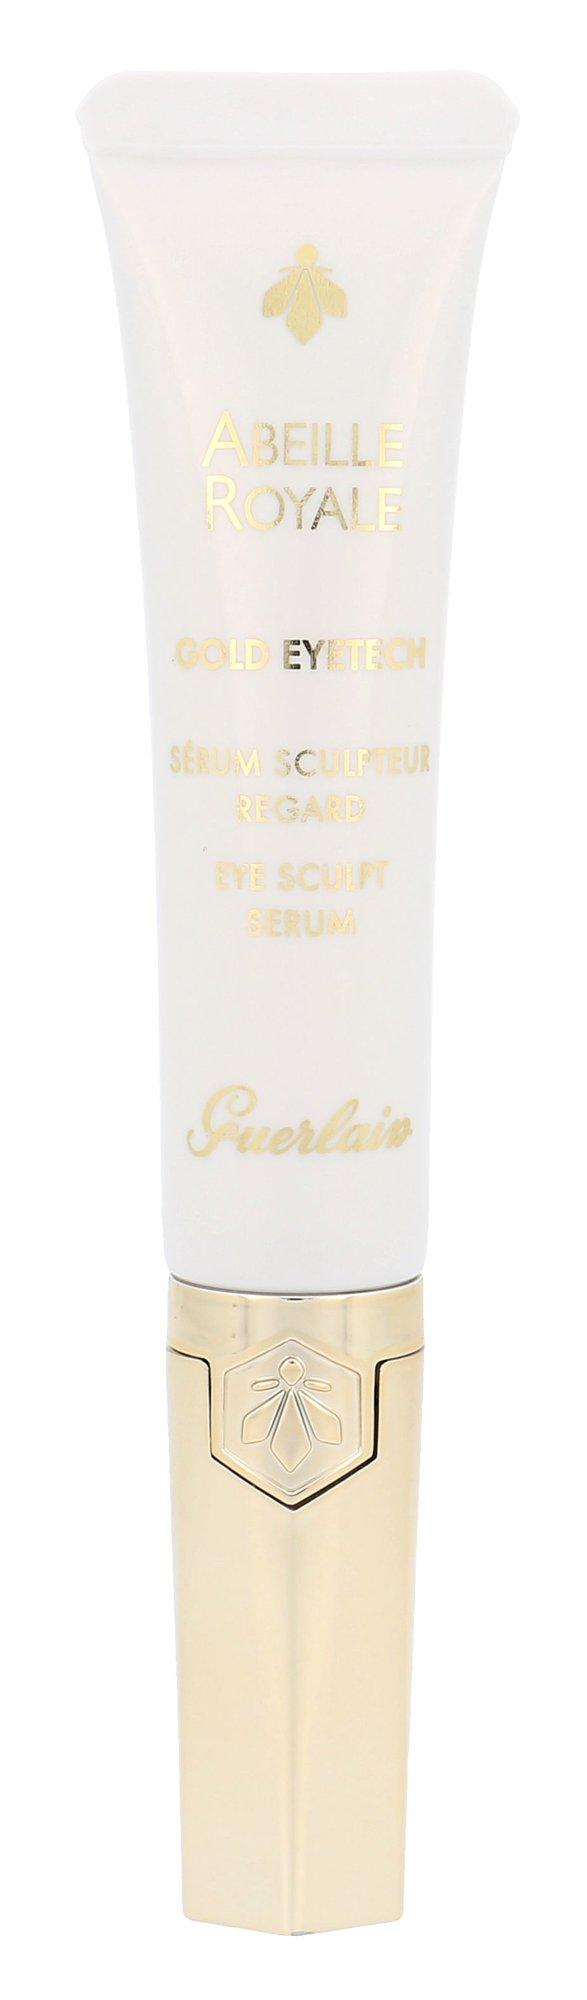 Guerlain Abeille Royale Cosmetic 15ml